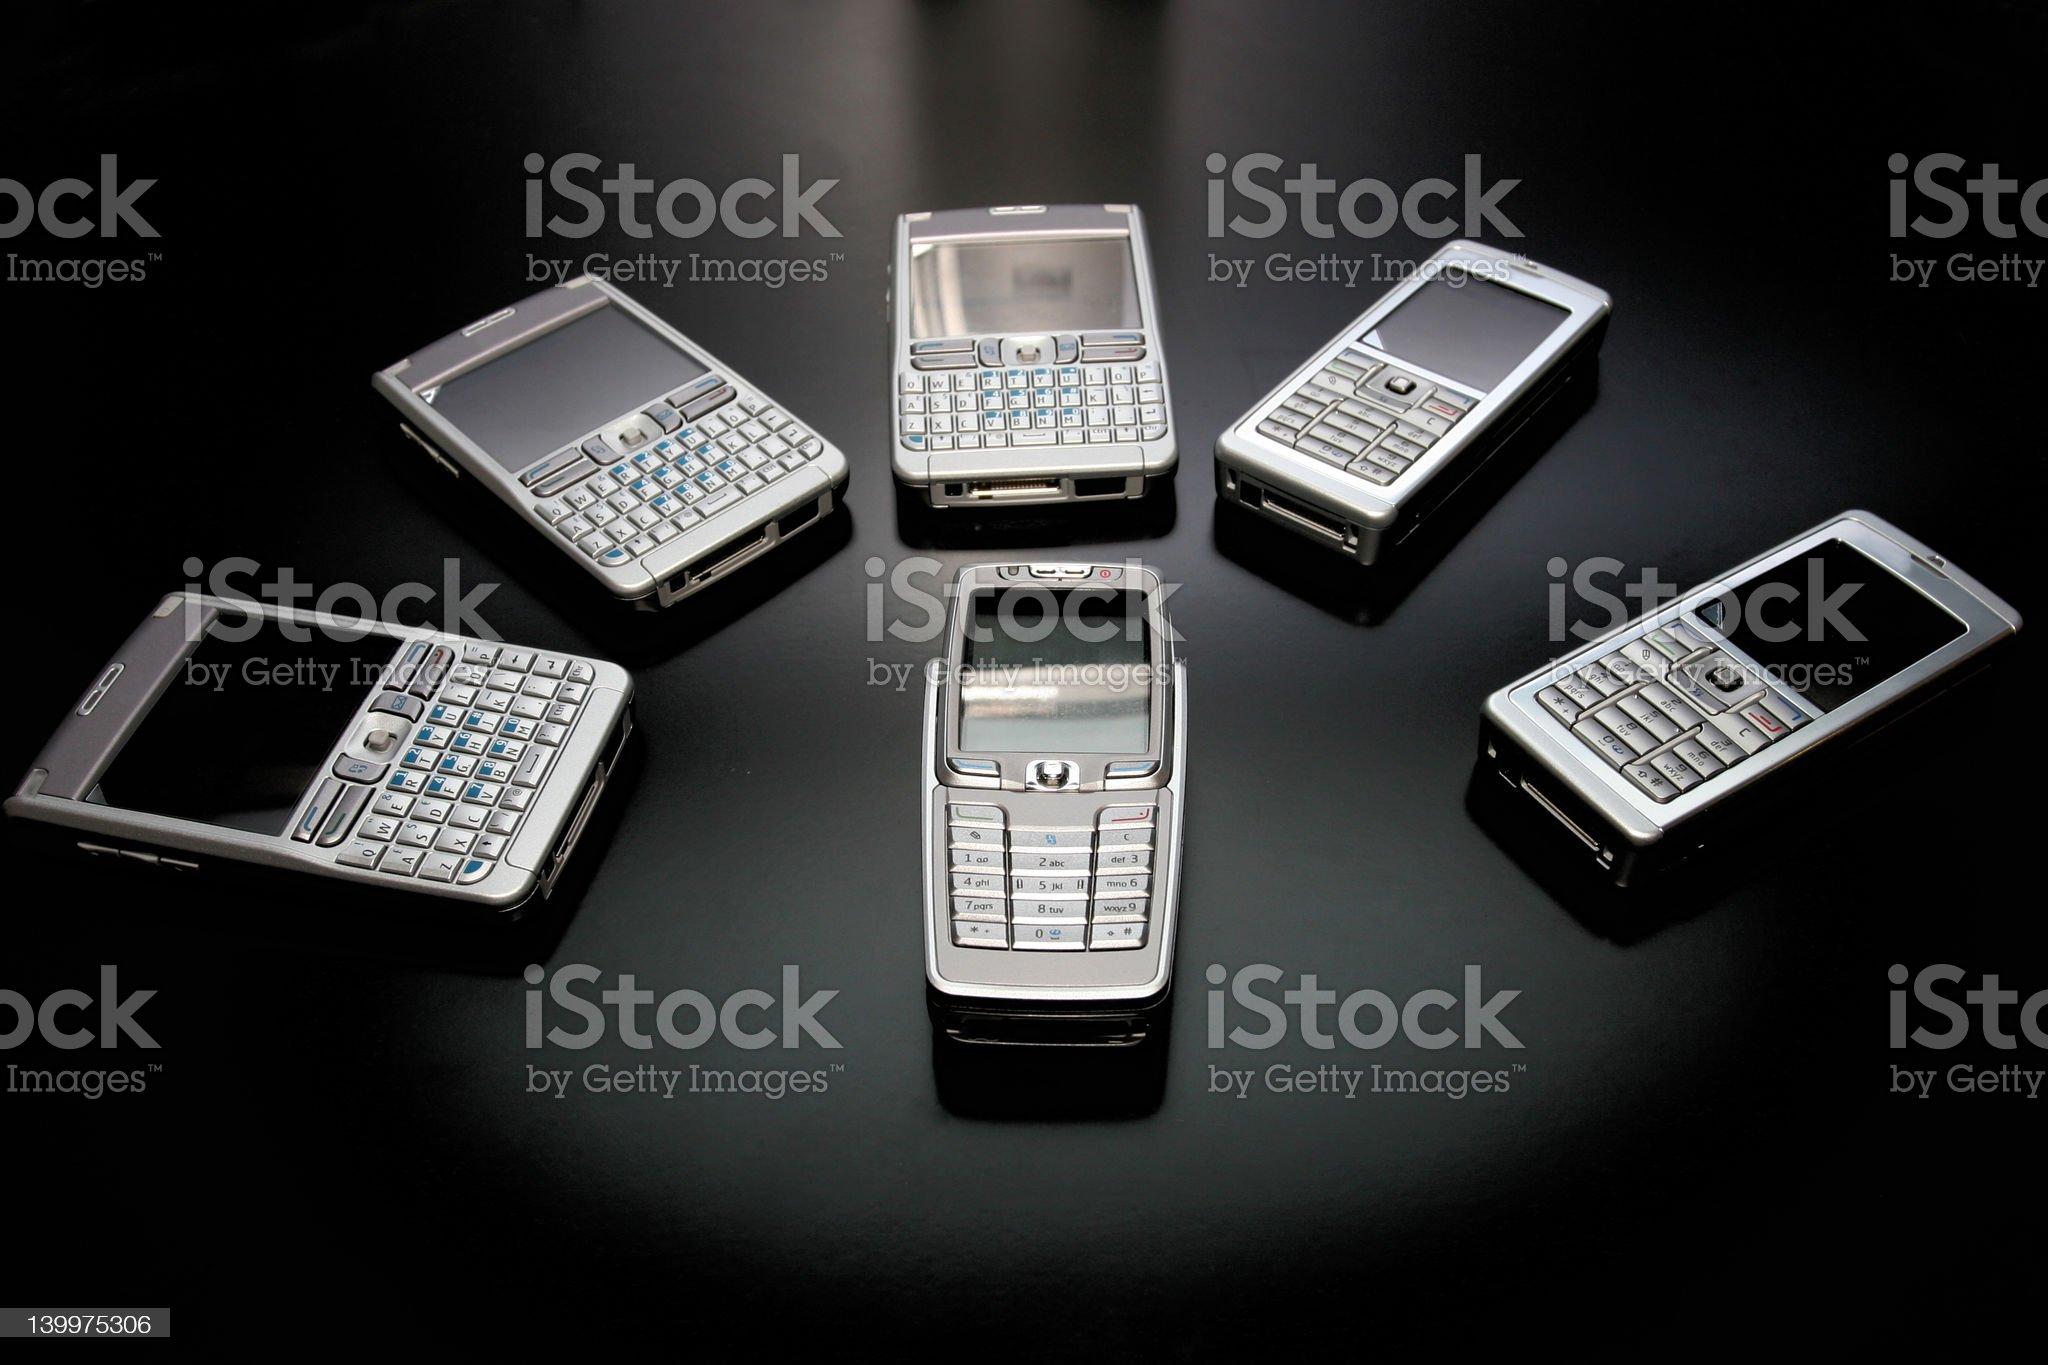 Phones royalty-free stock photo